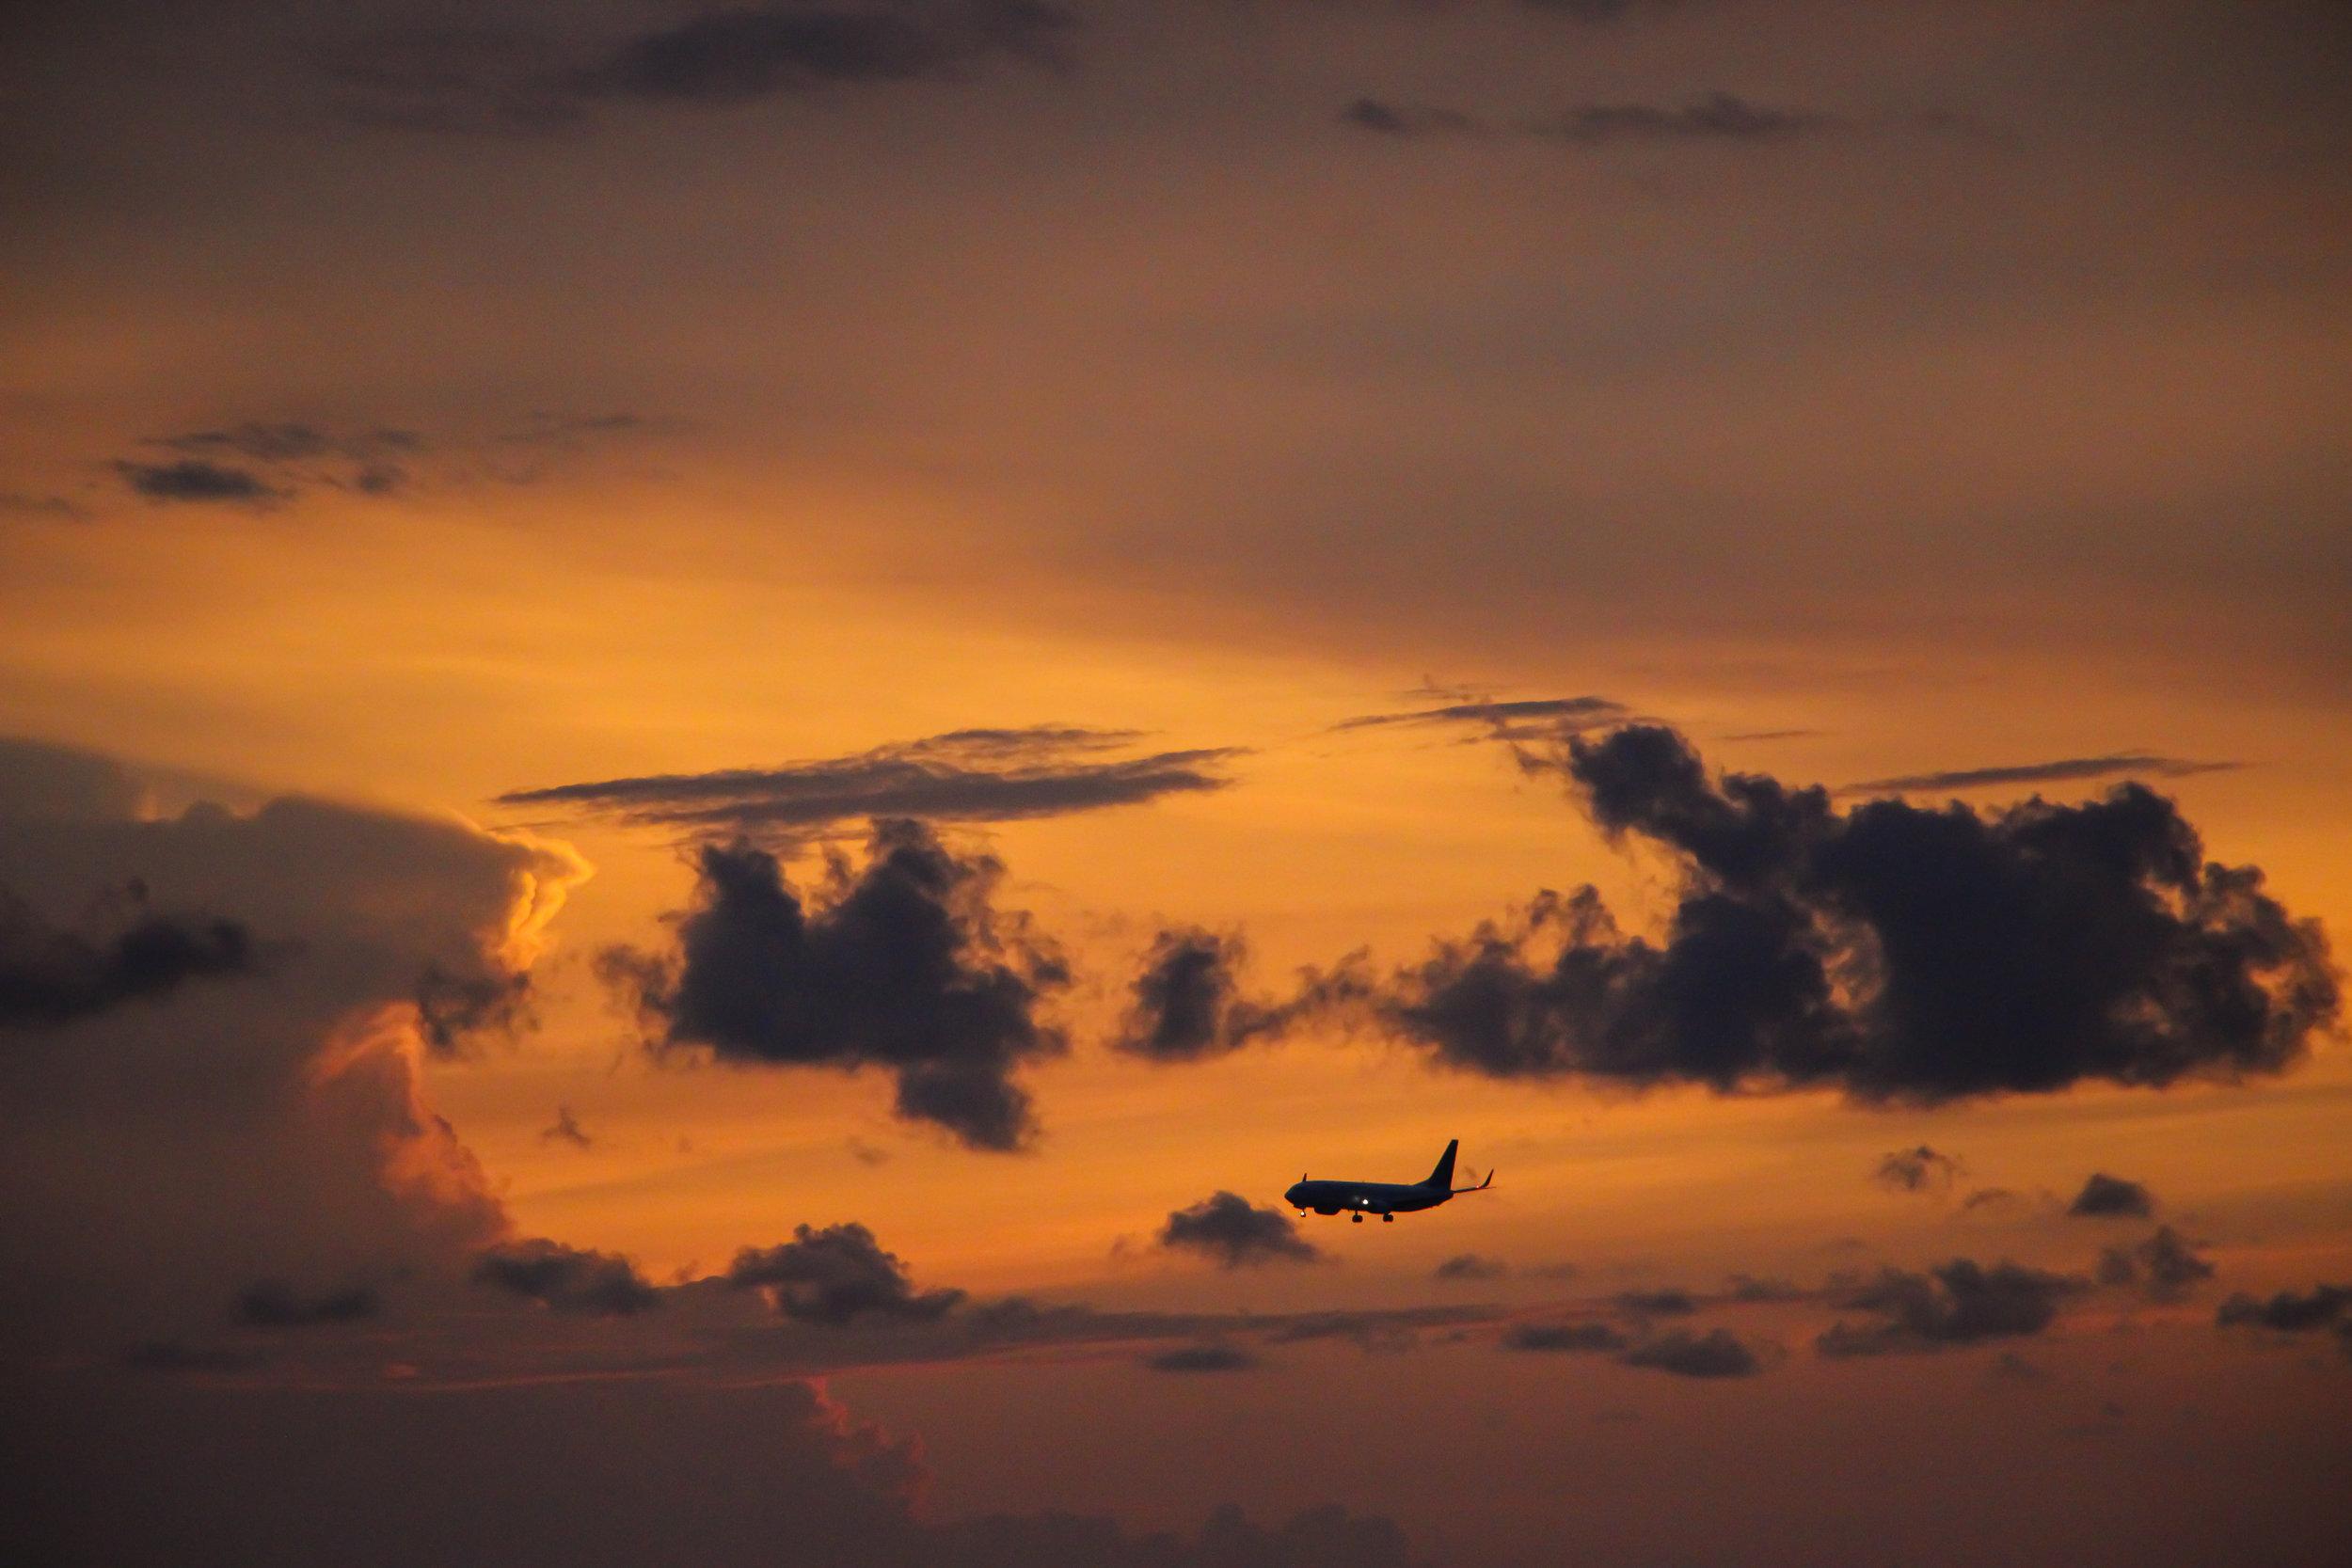 sunset, sky, clouds, airplane, Bali, Indonesia, Asia | DoLessGetMoreDone.com |